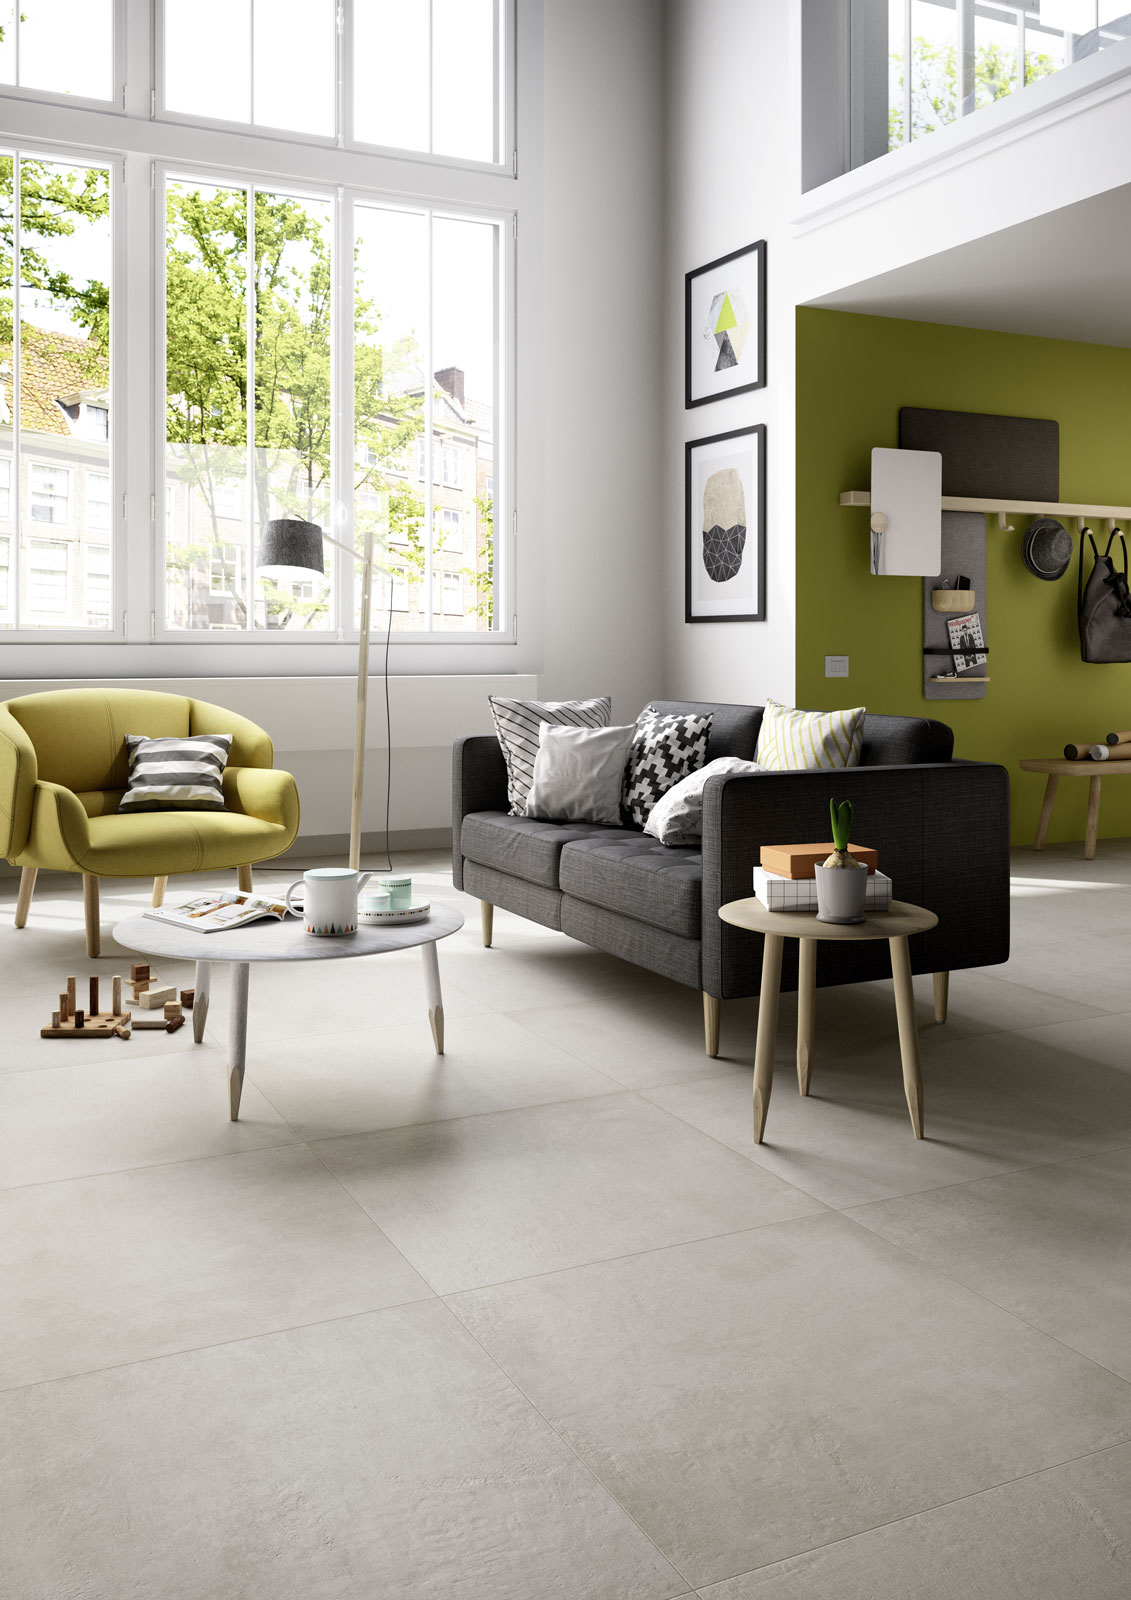 Tile Floor Designs For Living Rooms: Living Room Floor: Inspiration For Your Furniture